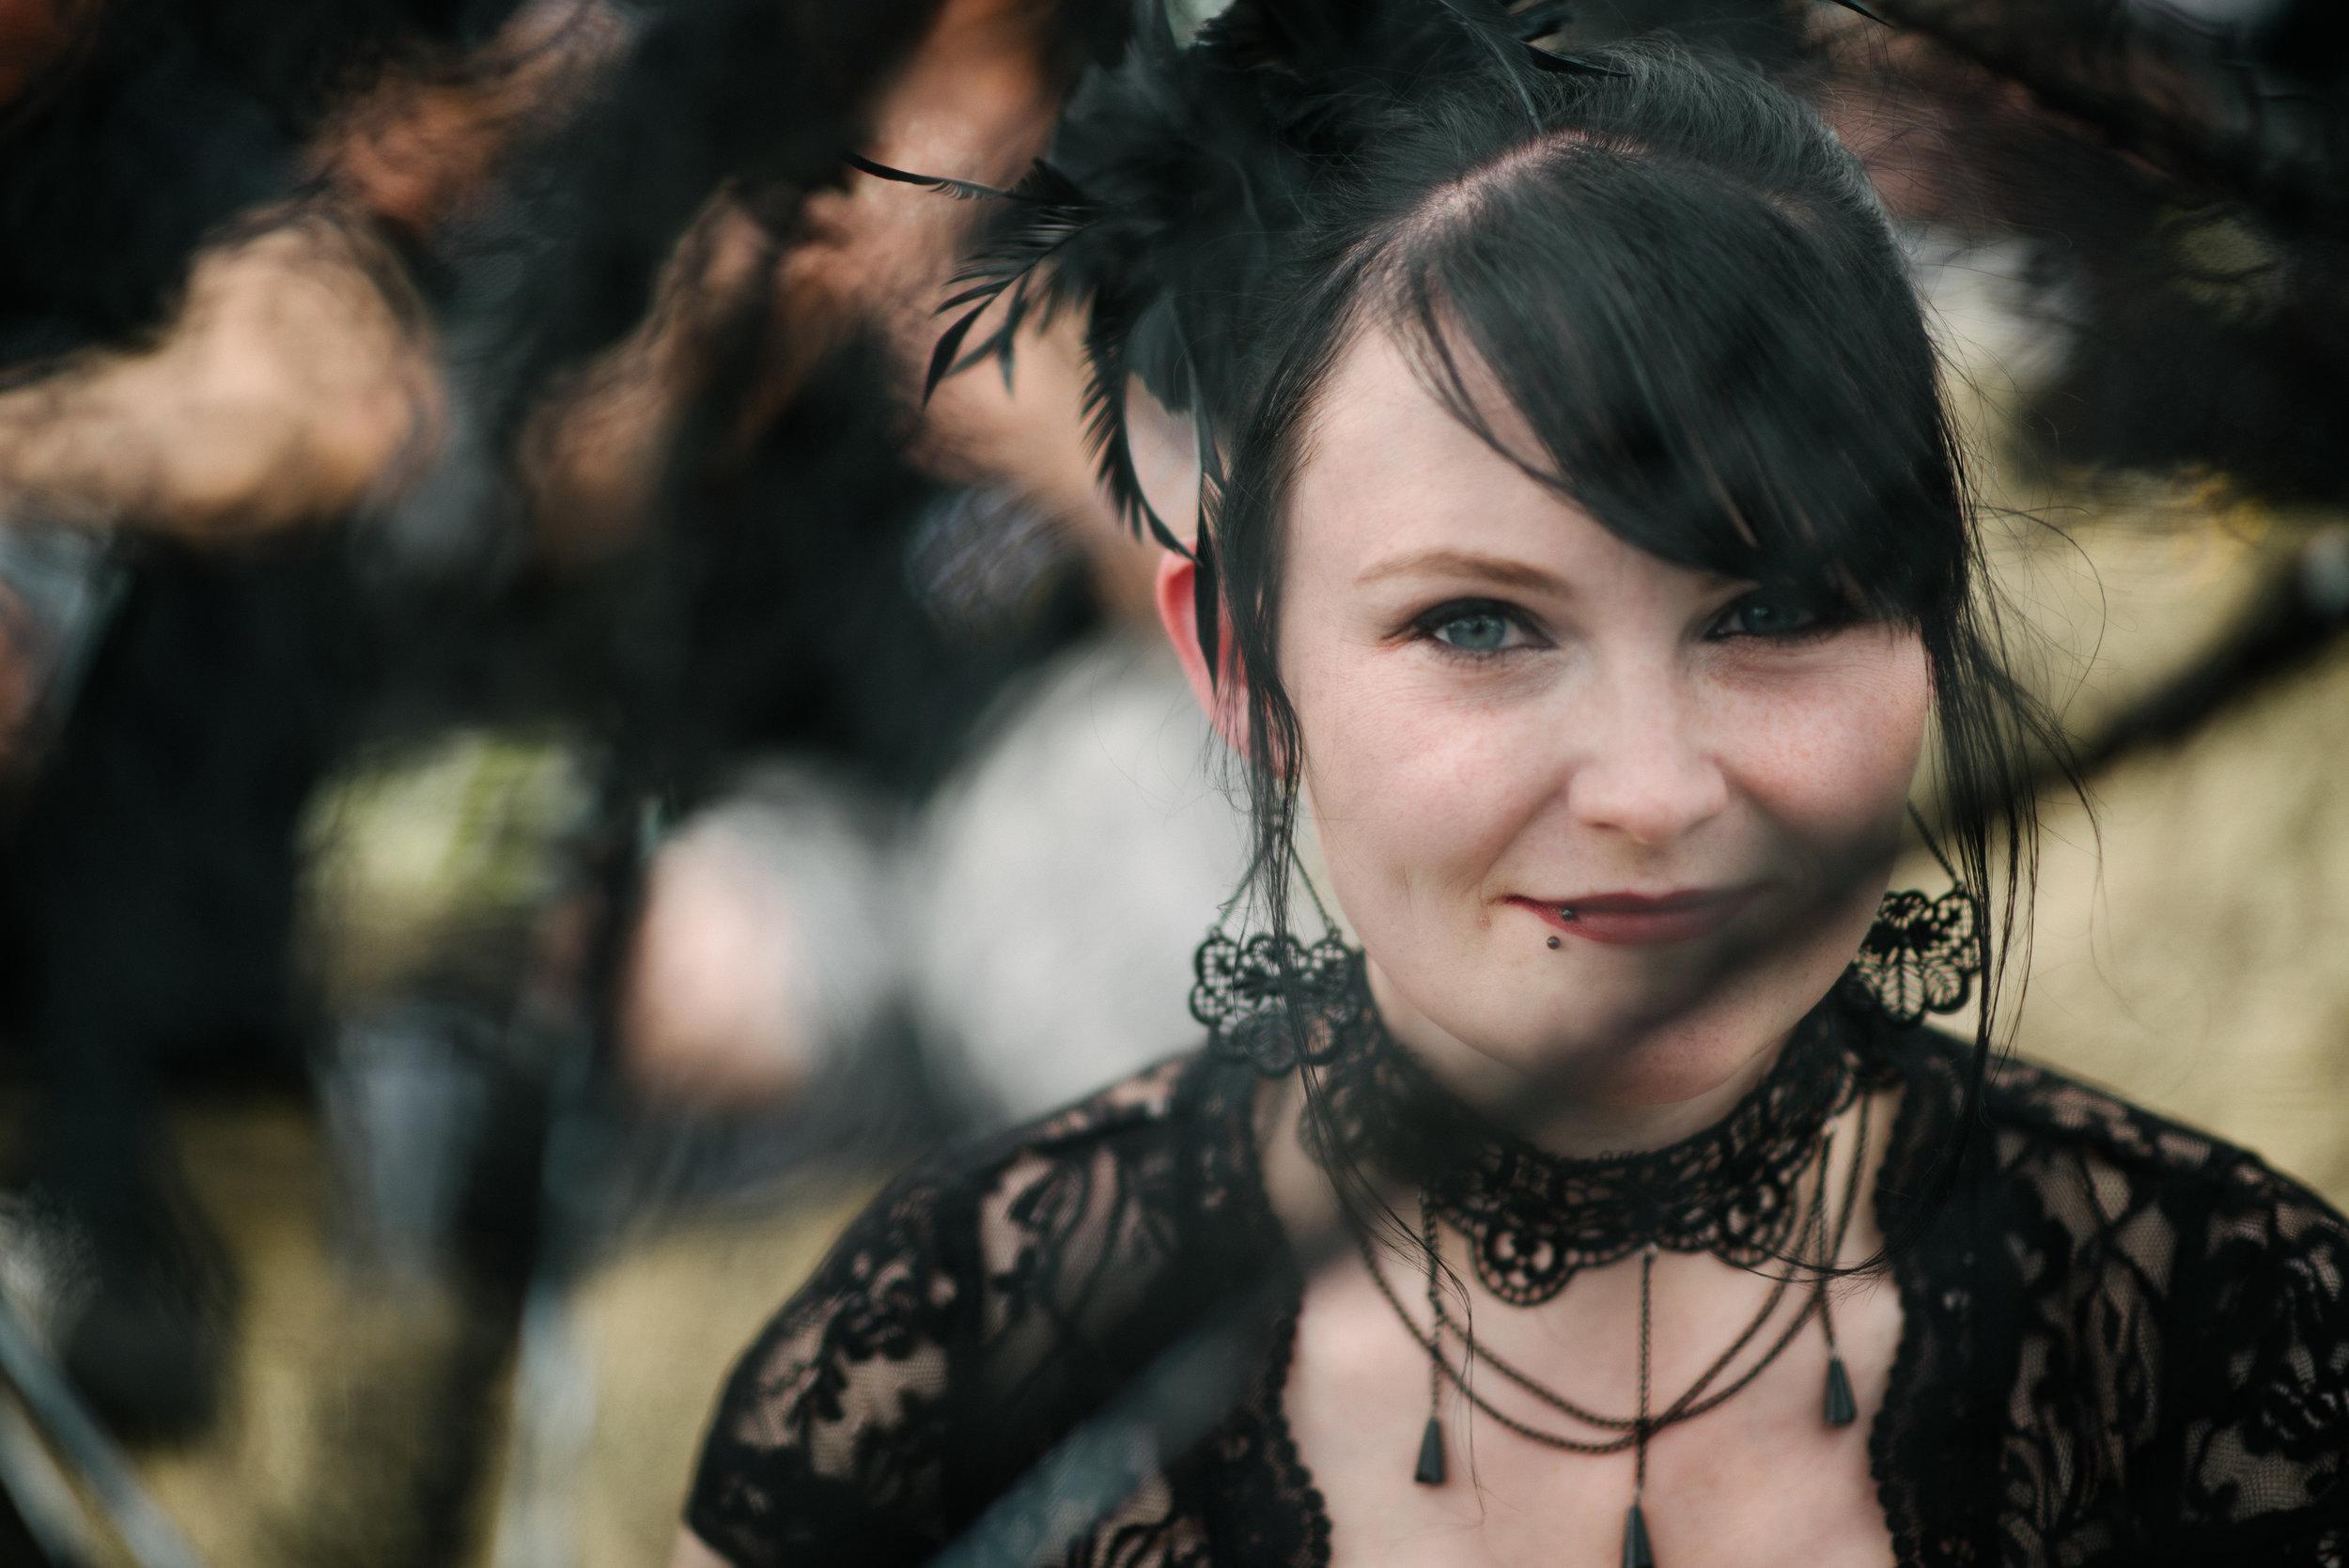 ML_16_Faces of Mera Luna_Robin_Schmiedebach_154030.jpg